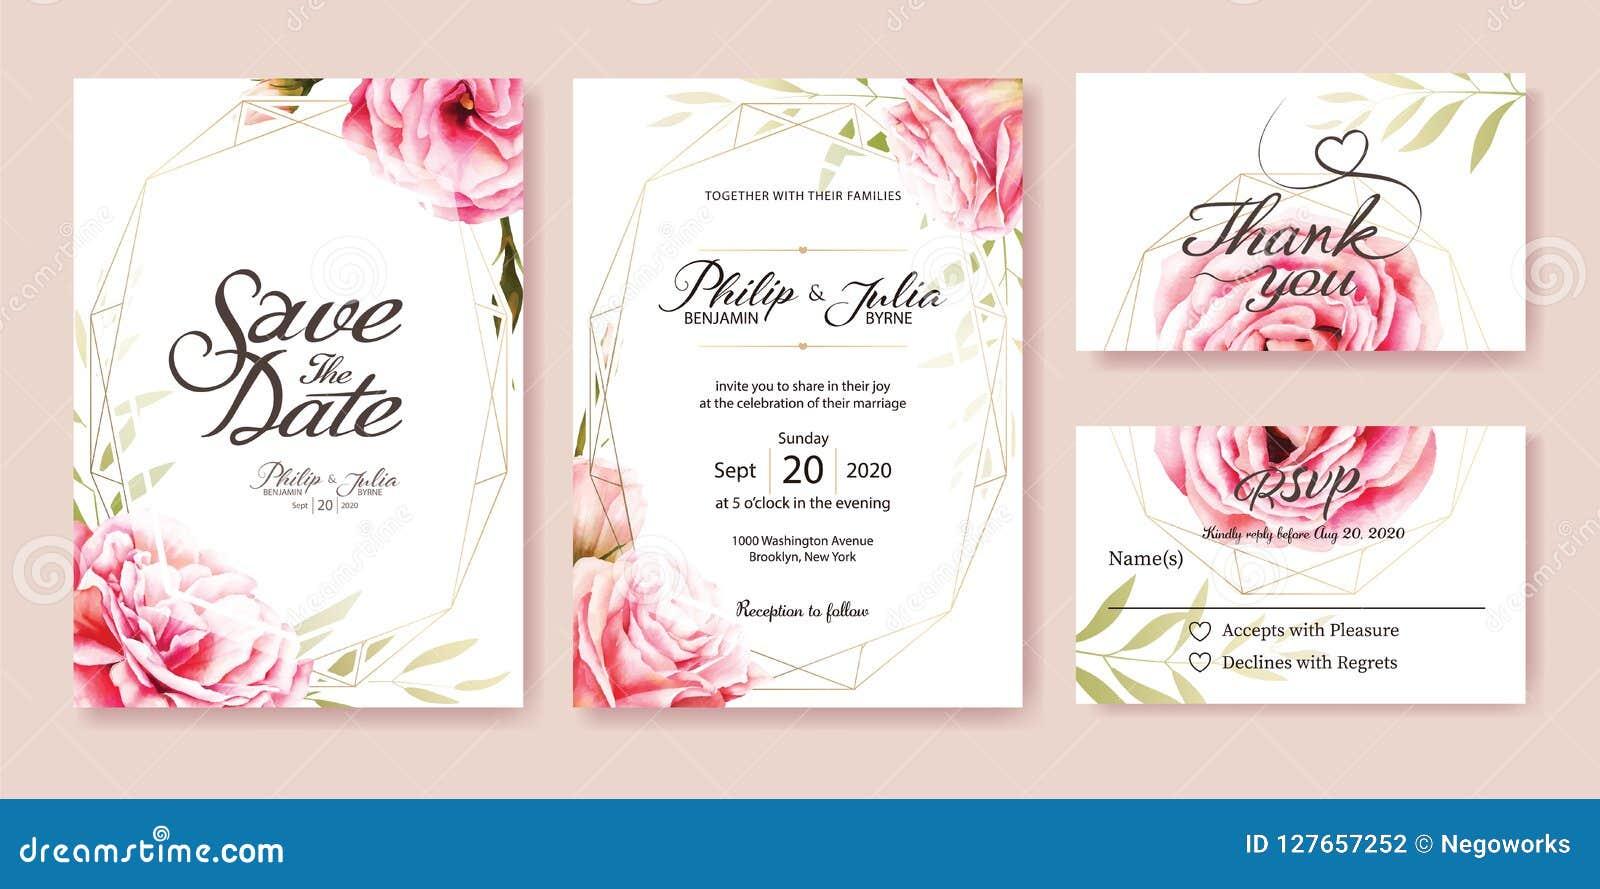 Pink rose wedding Invitation. Watercolor style. Vector.